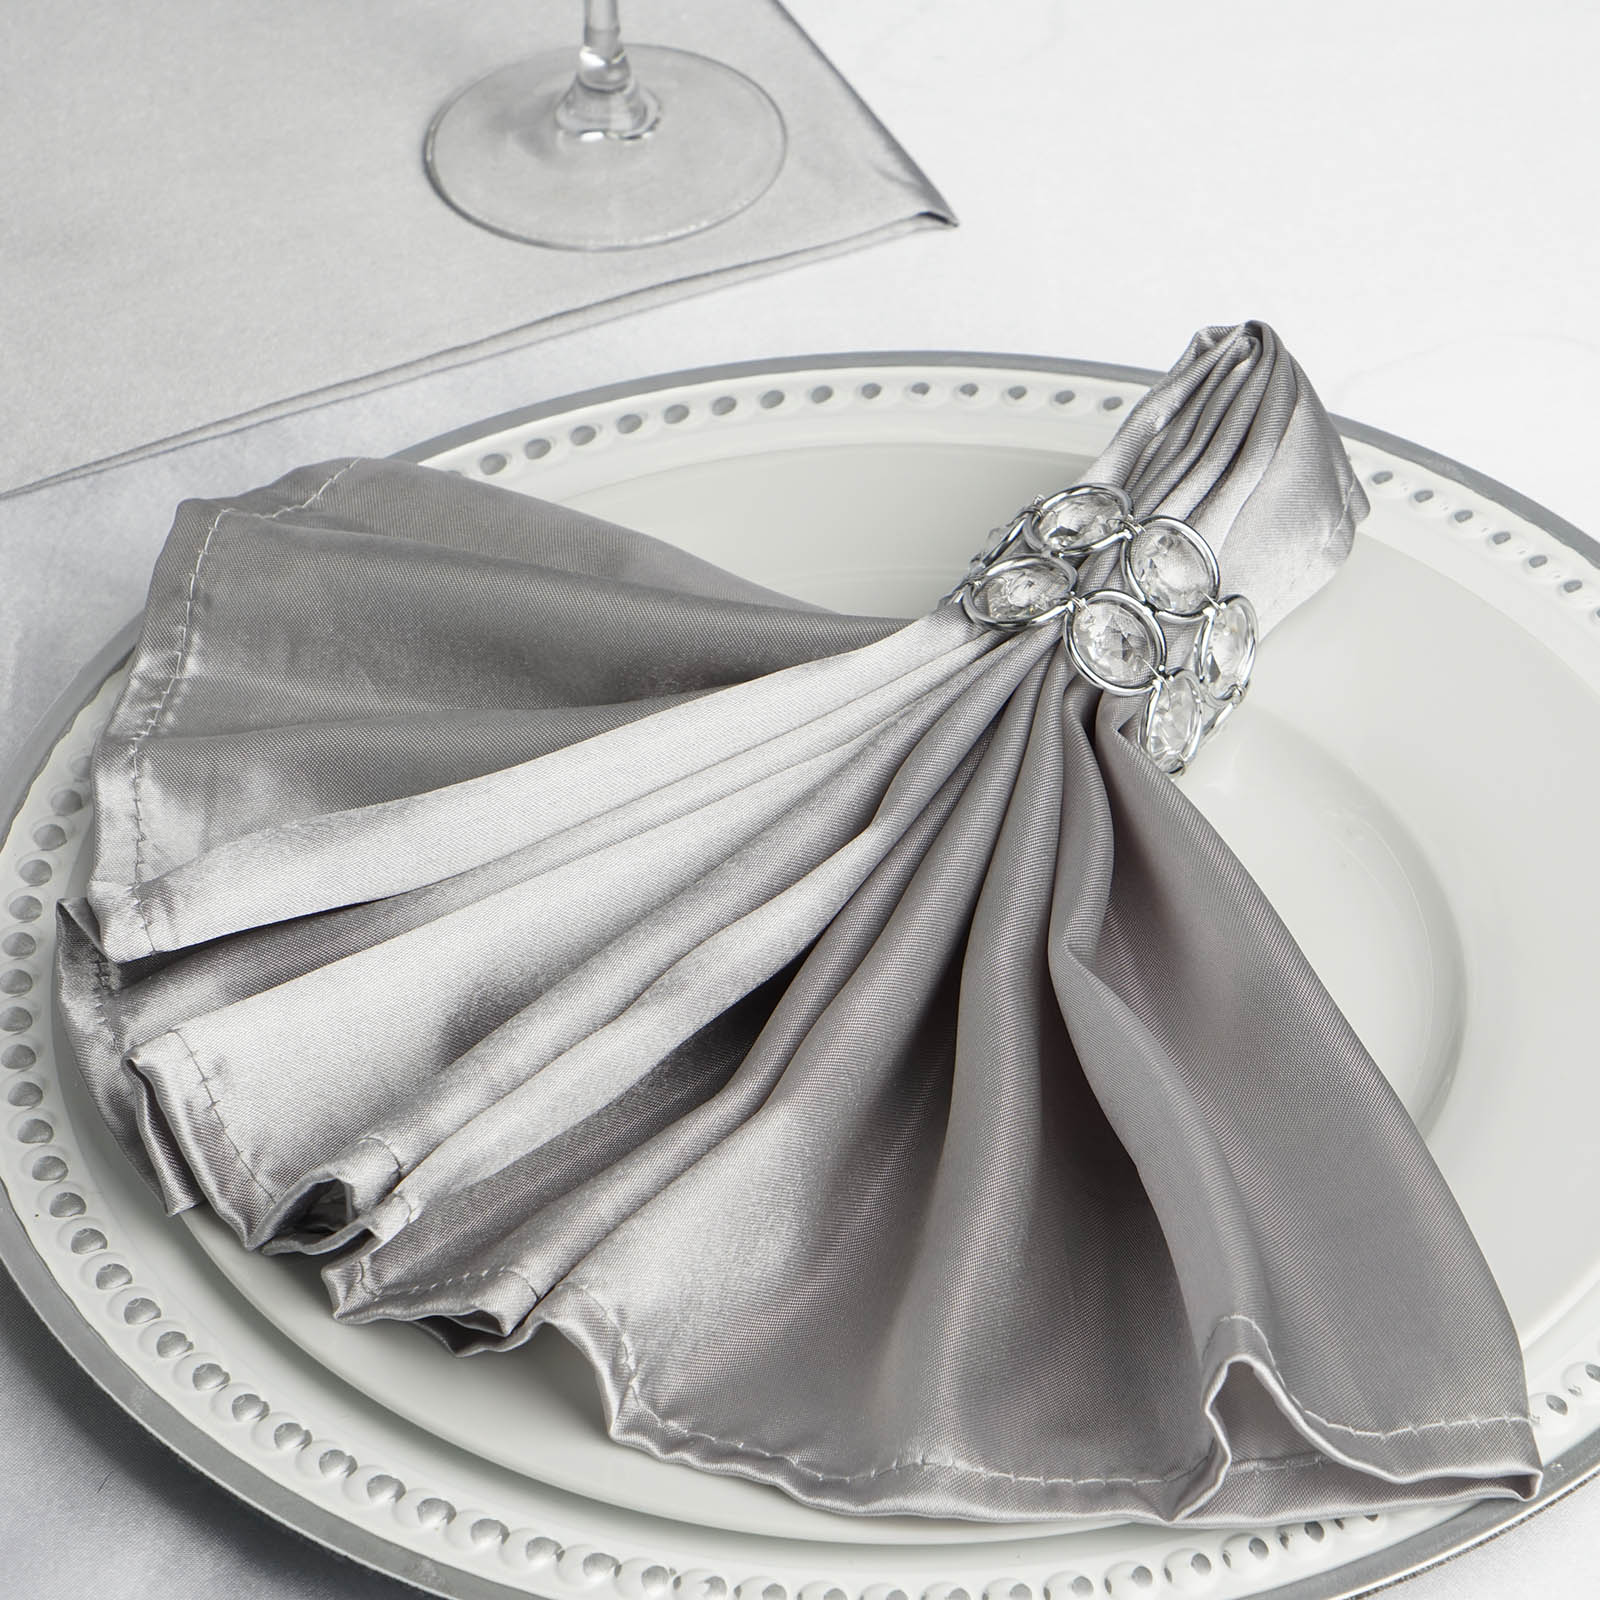 Linens Textiles 10 Navy Blue Polyester 20x20 Wedding Napkins Party Table Linens Decorations Fibsol Com